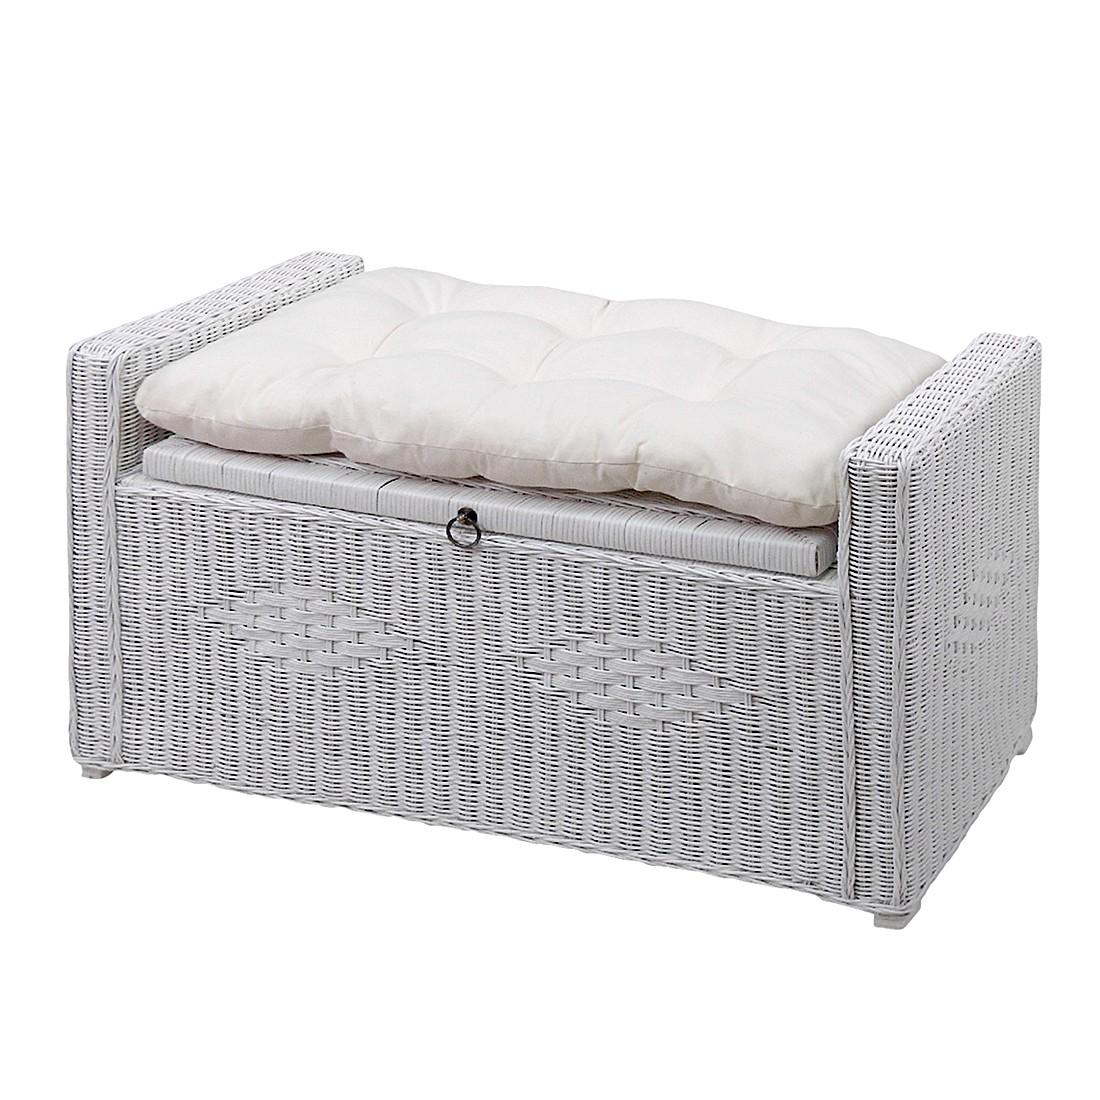 Sitztruhe Farma – Rattan Weiß, Home Design kaufen